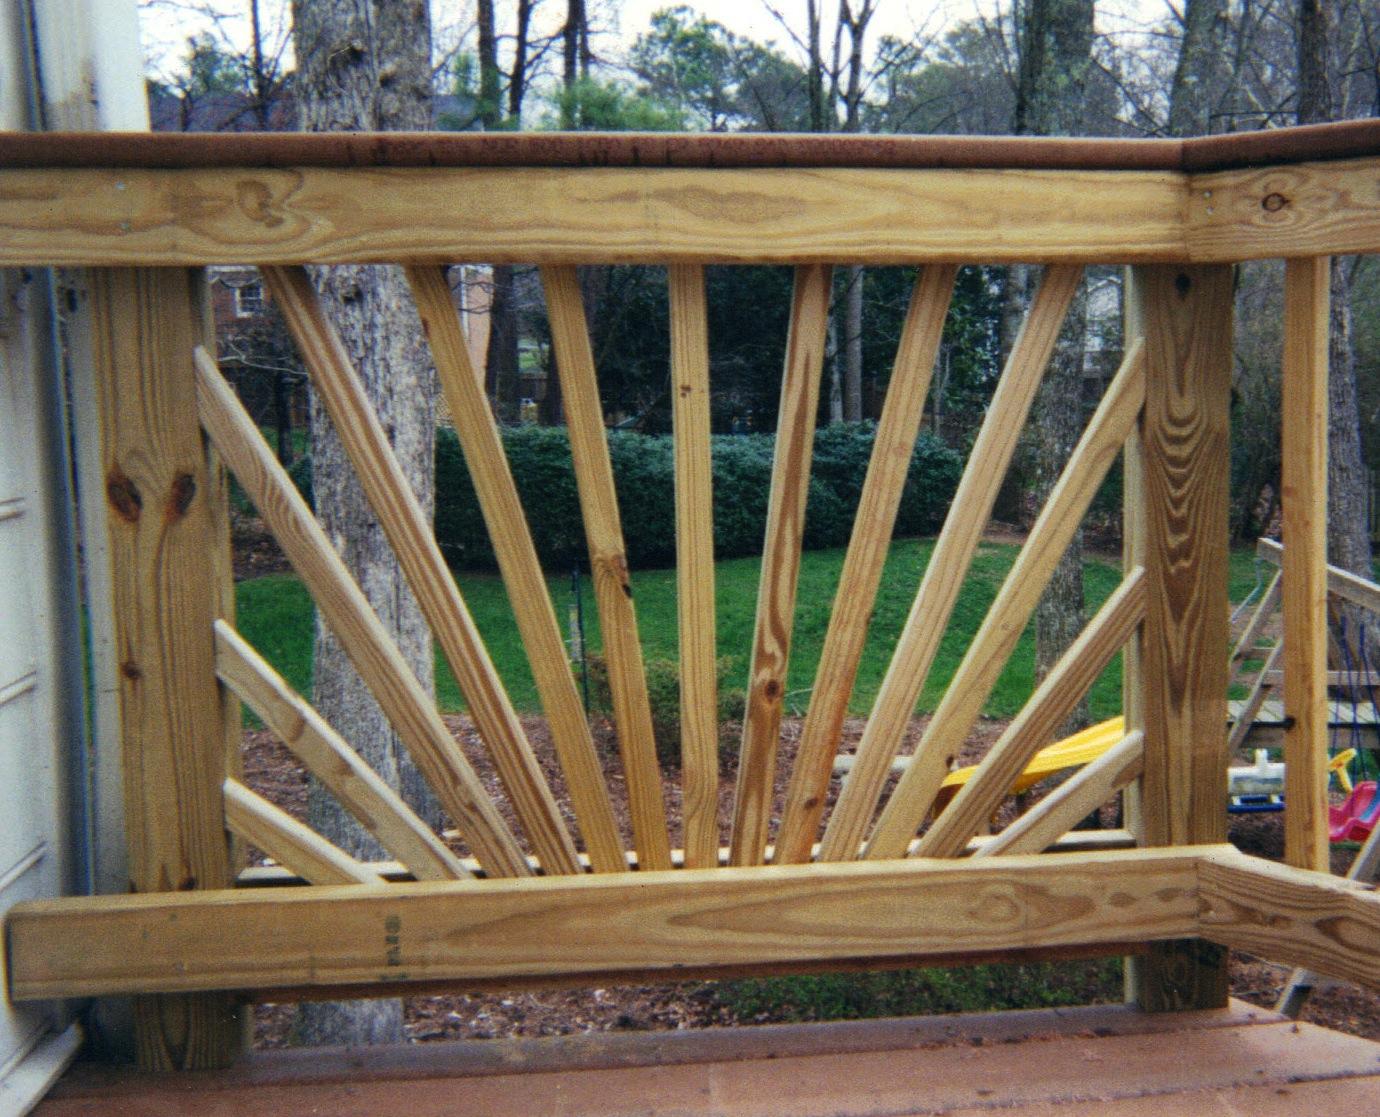 Decorative starburst handrail design affordable fence for Decorative railings